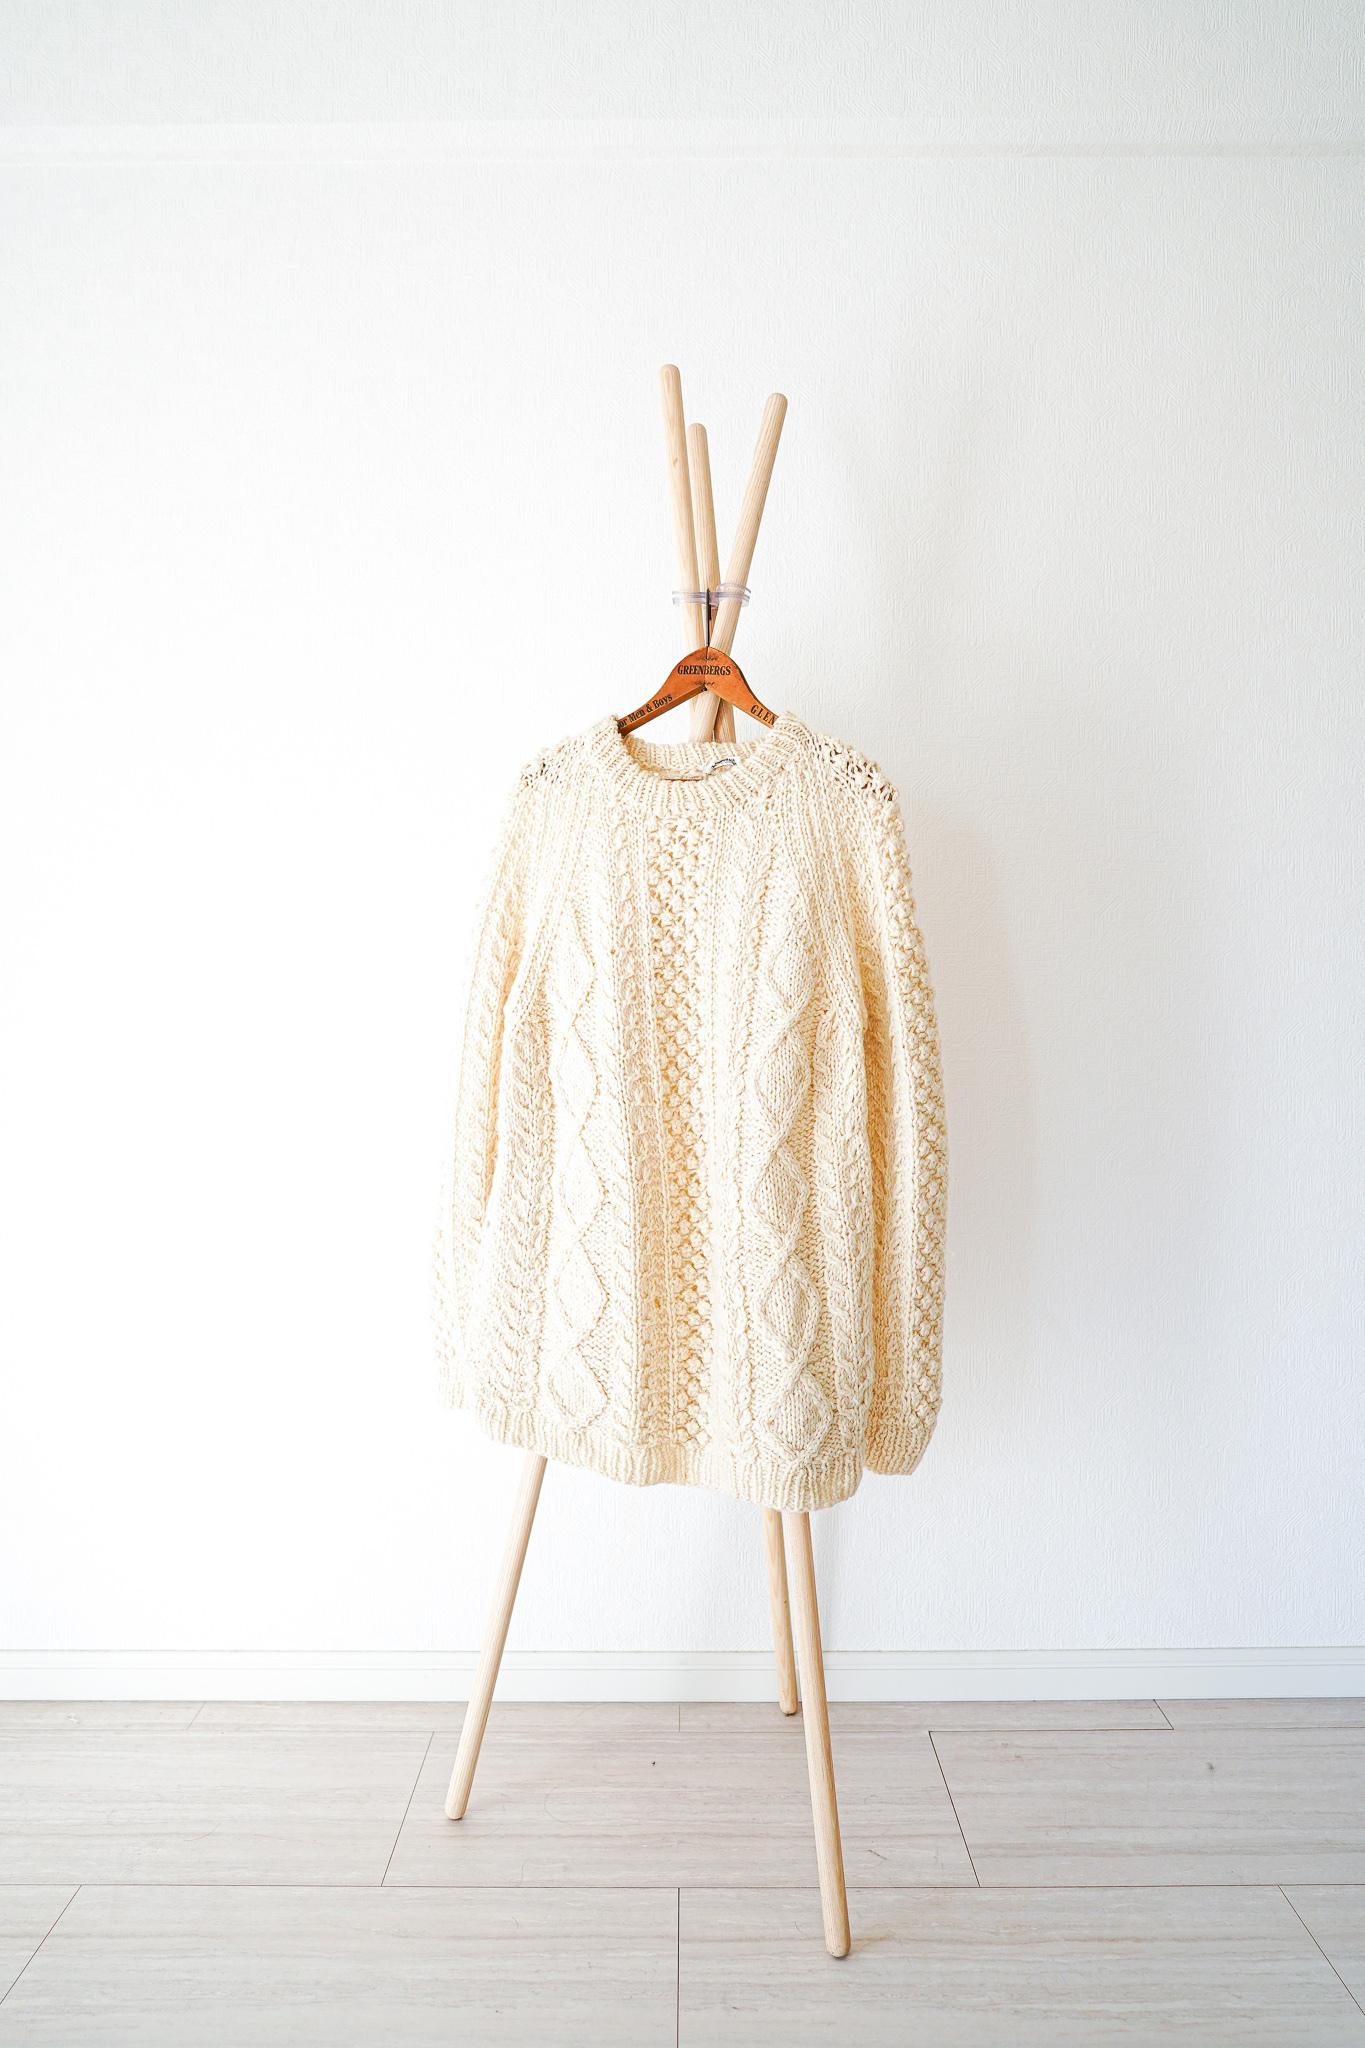 "【1980-90s】""Fisherman Sweater"" Vintage Wool Knitting / v350"